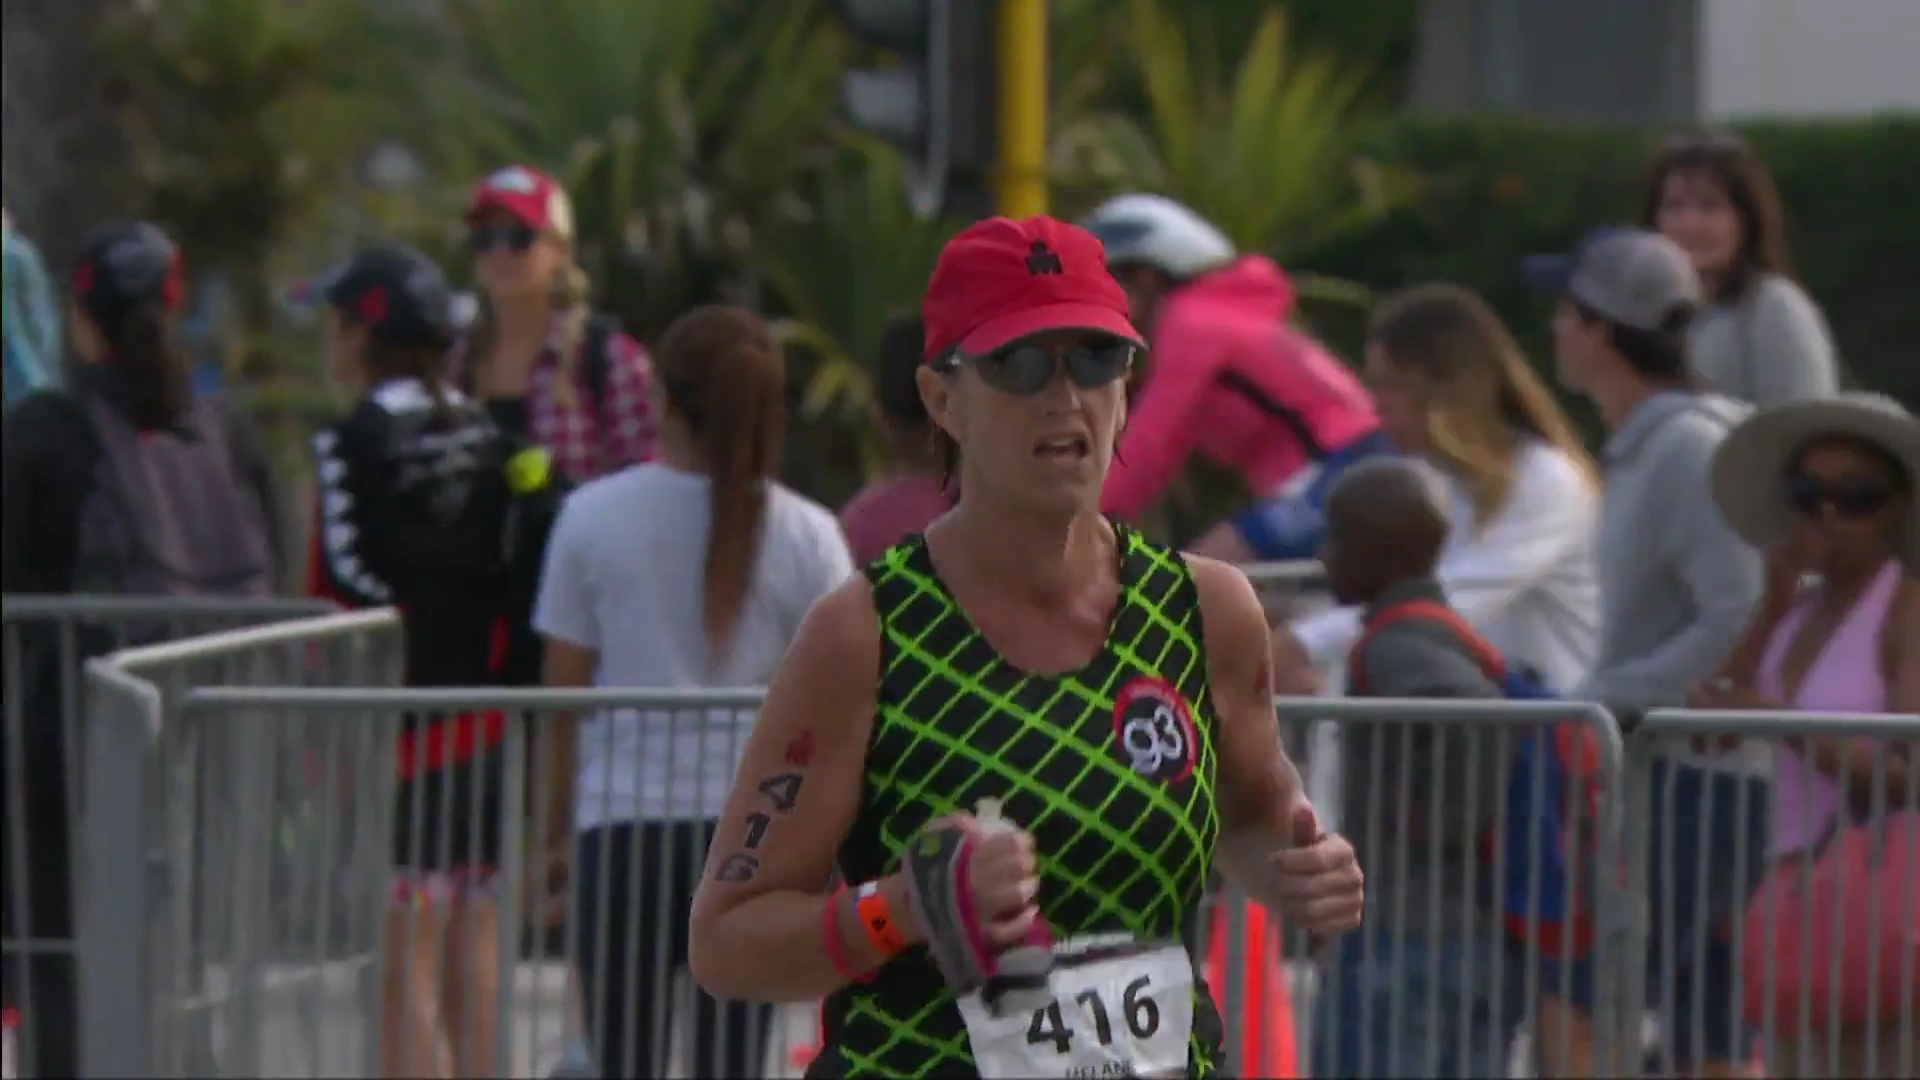 Melanie Cameron – Ironman World Championship 2018 10